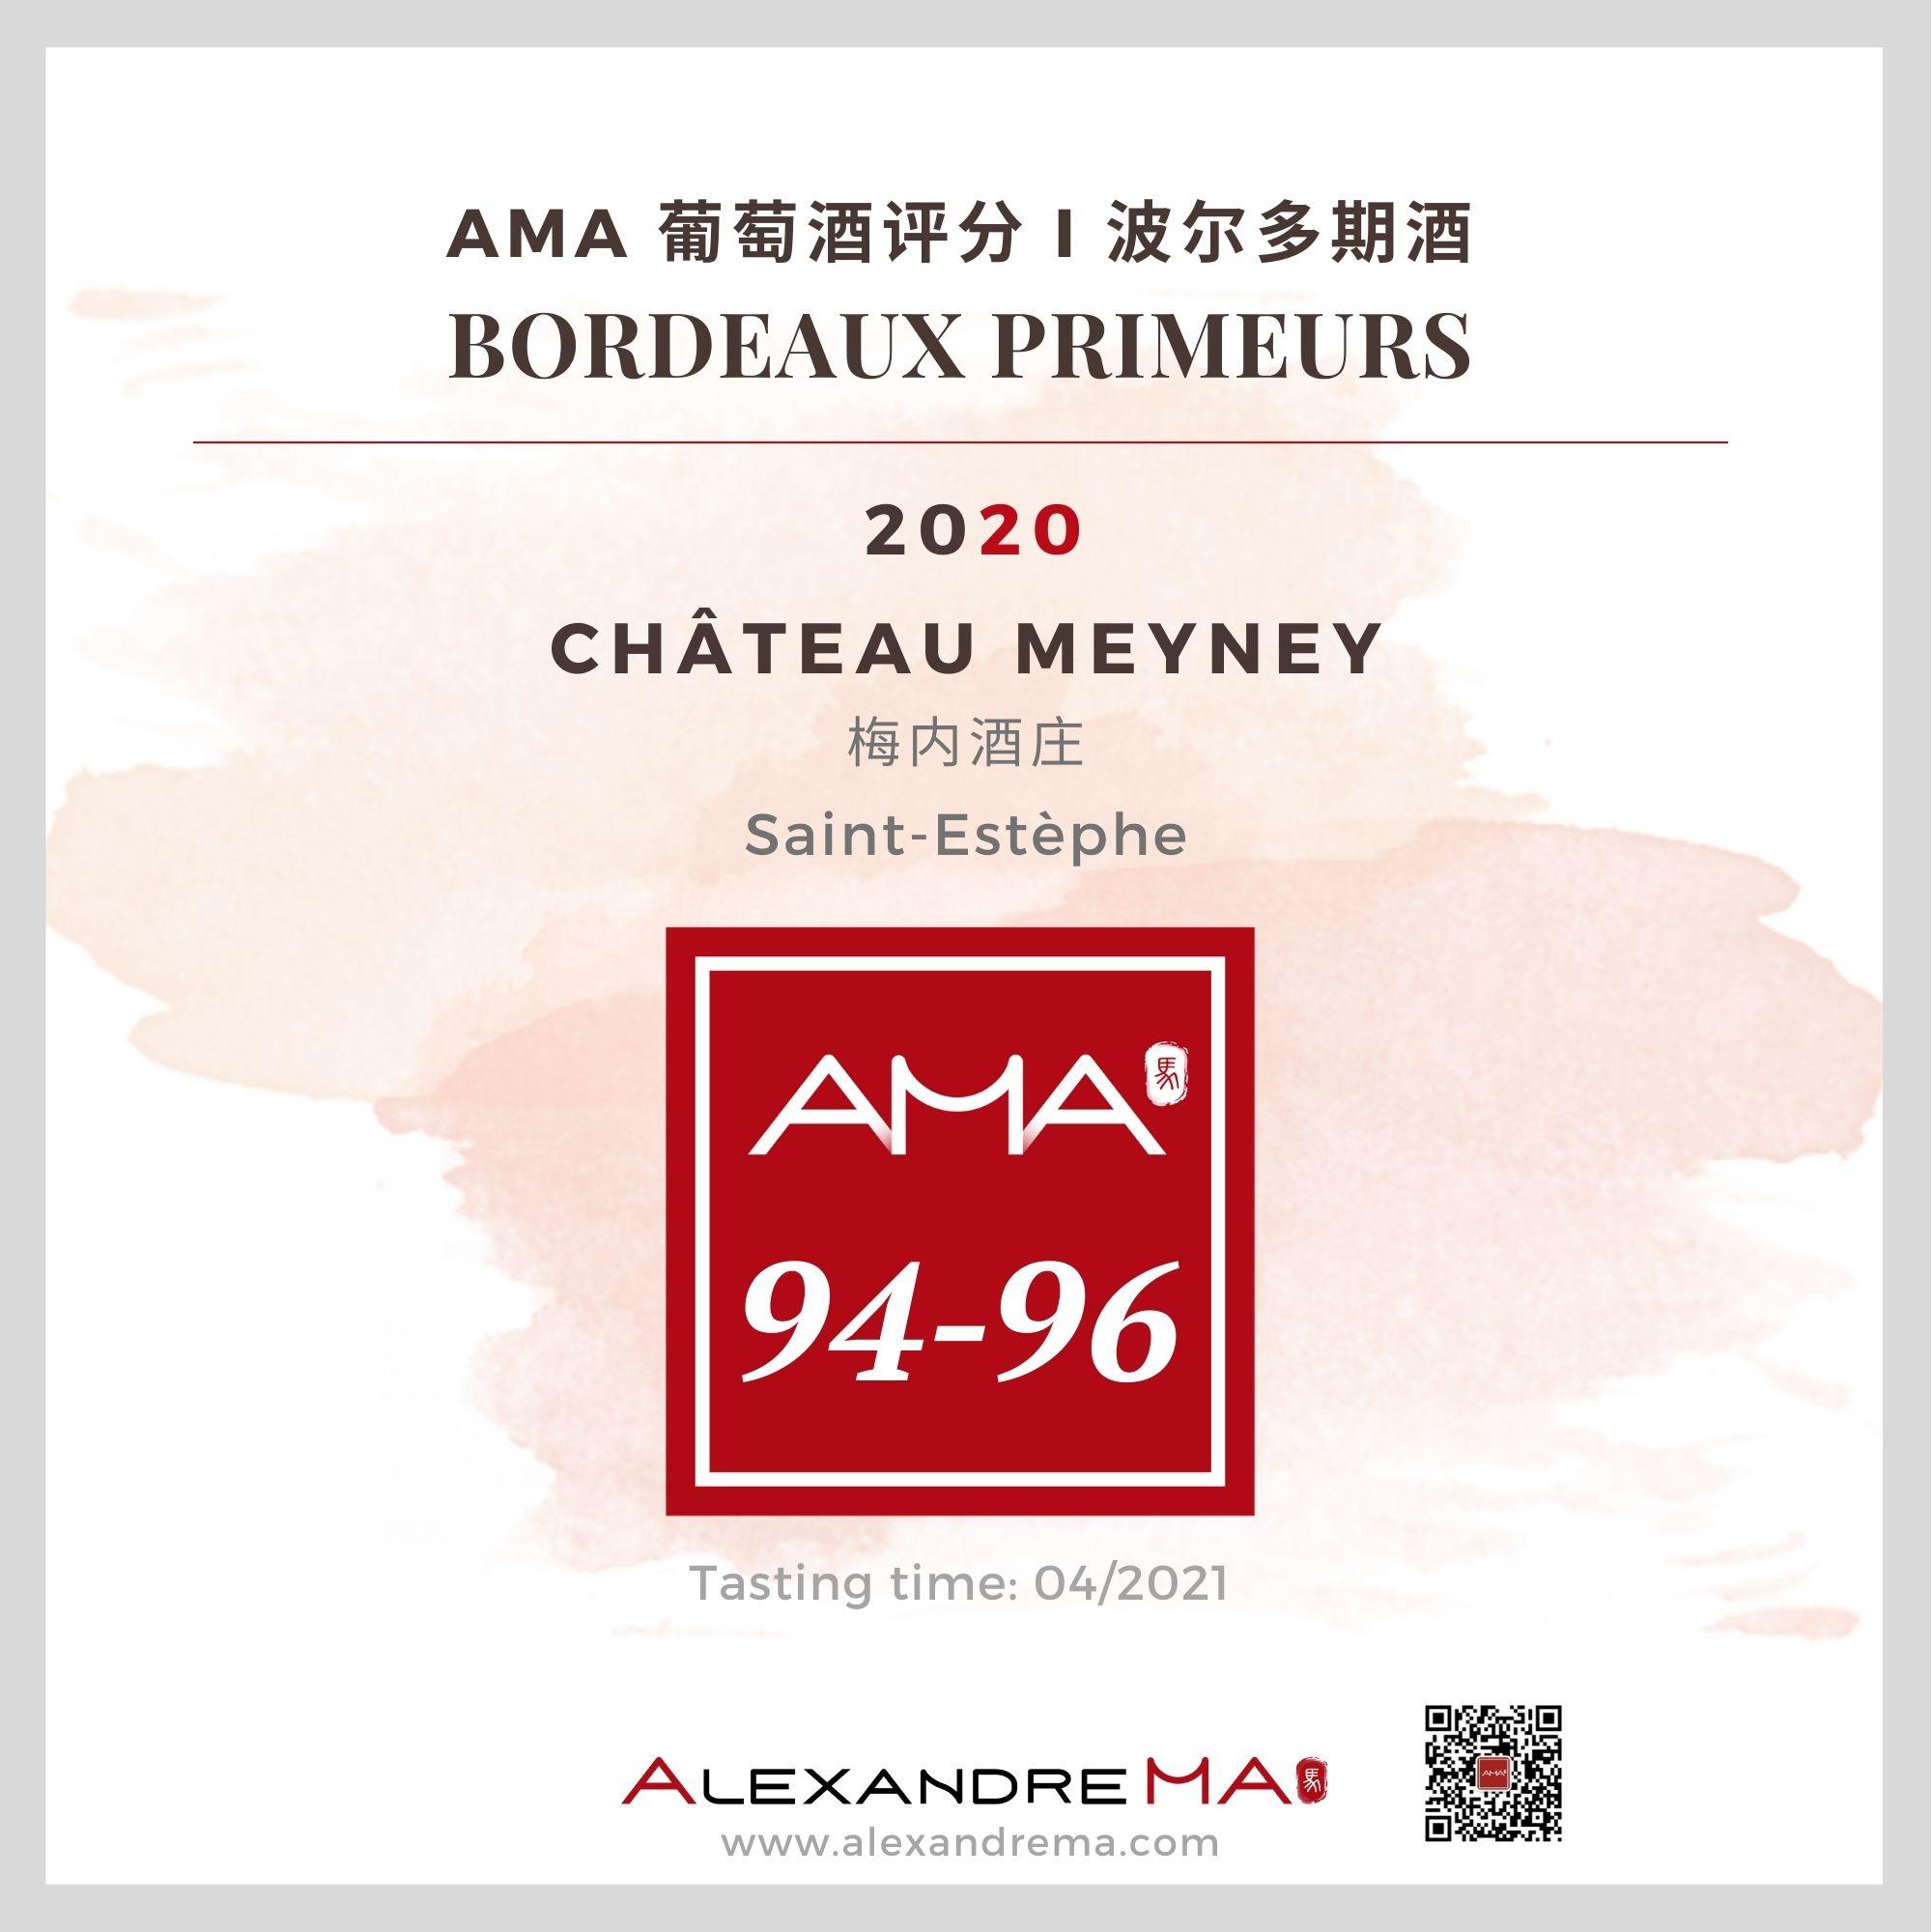 Château Meyney 2020 梅内酒庄 - Alexandre Ma